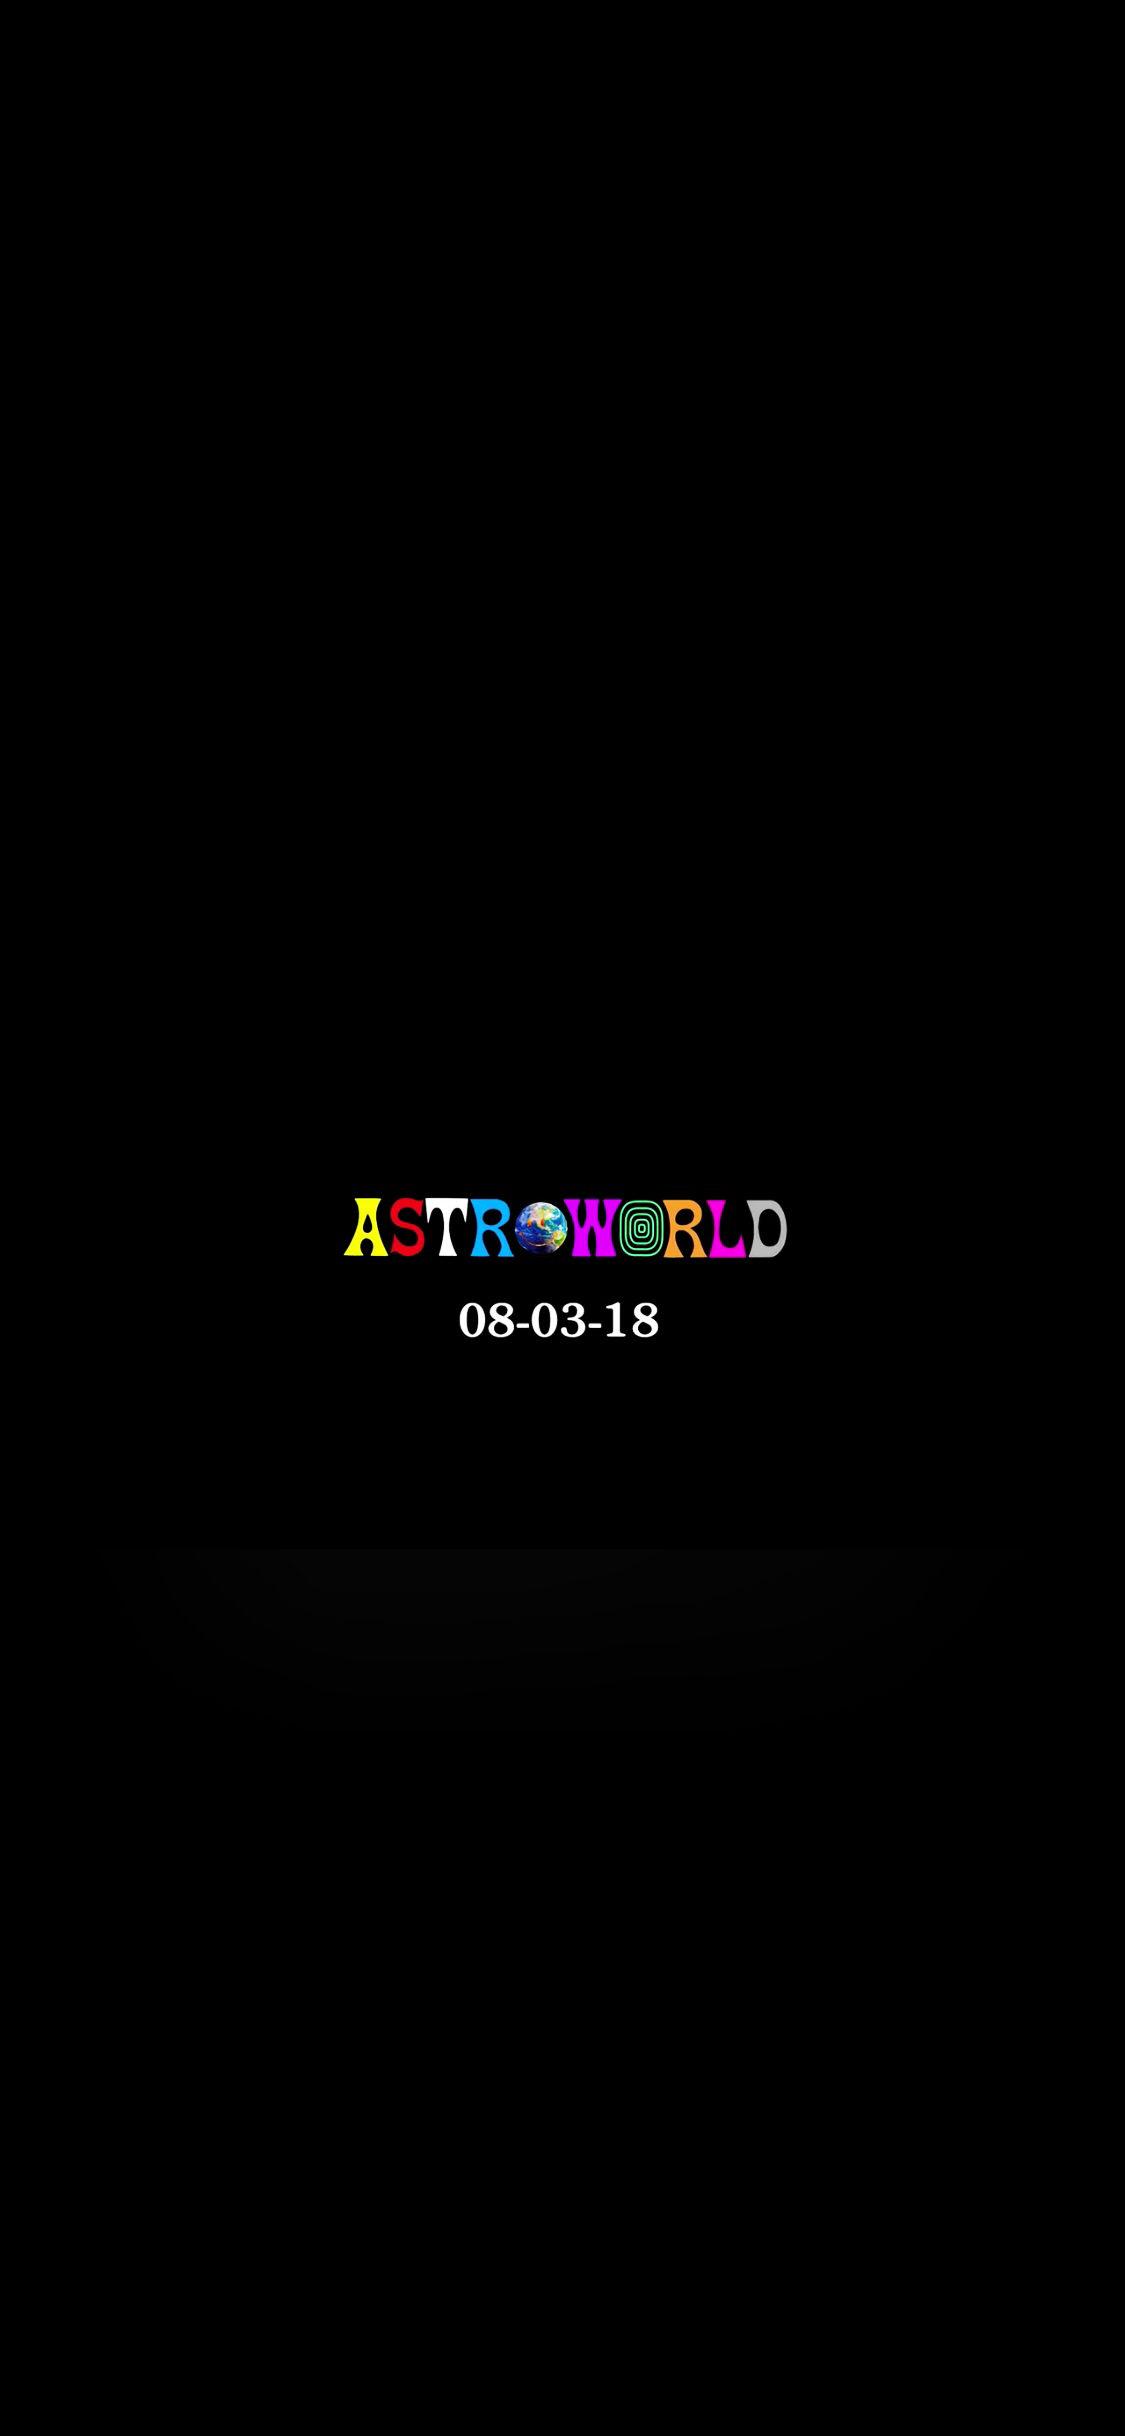 Astroworld Wallpaper from Apple Music trailer iPhone X   Imgur 1125x2436